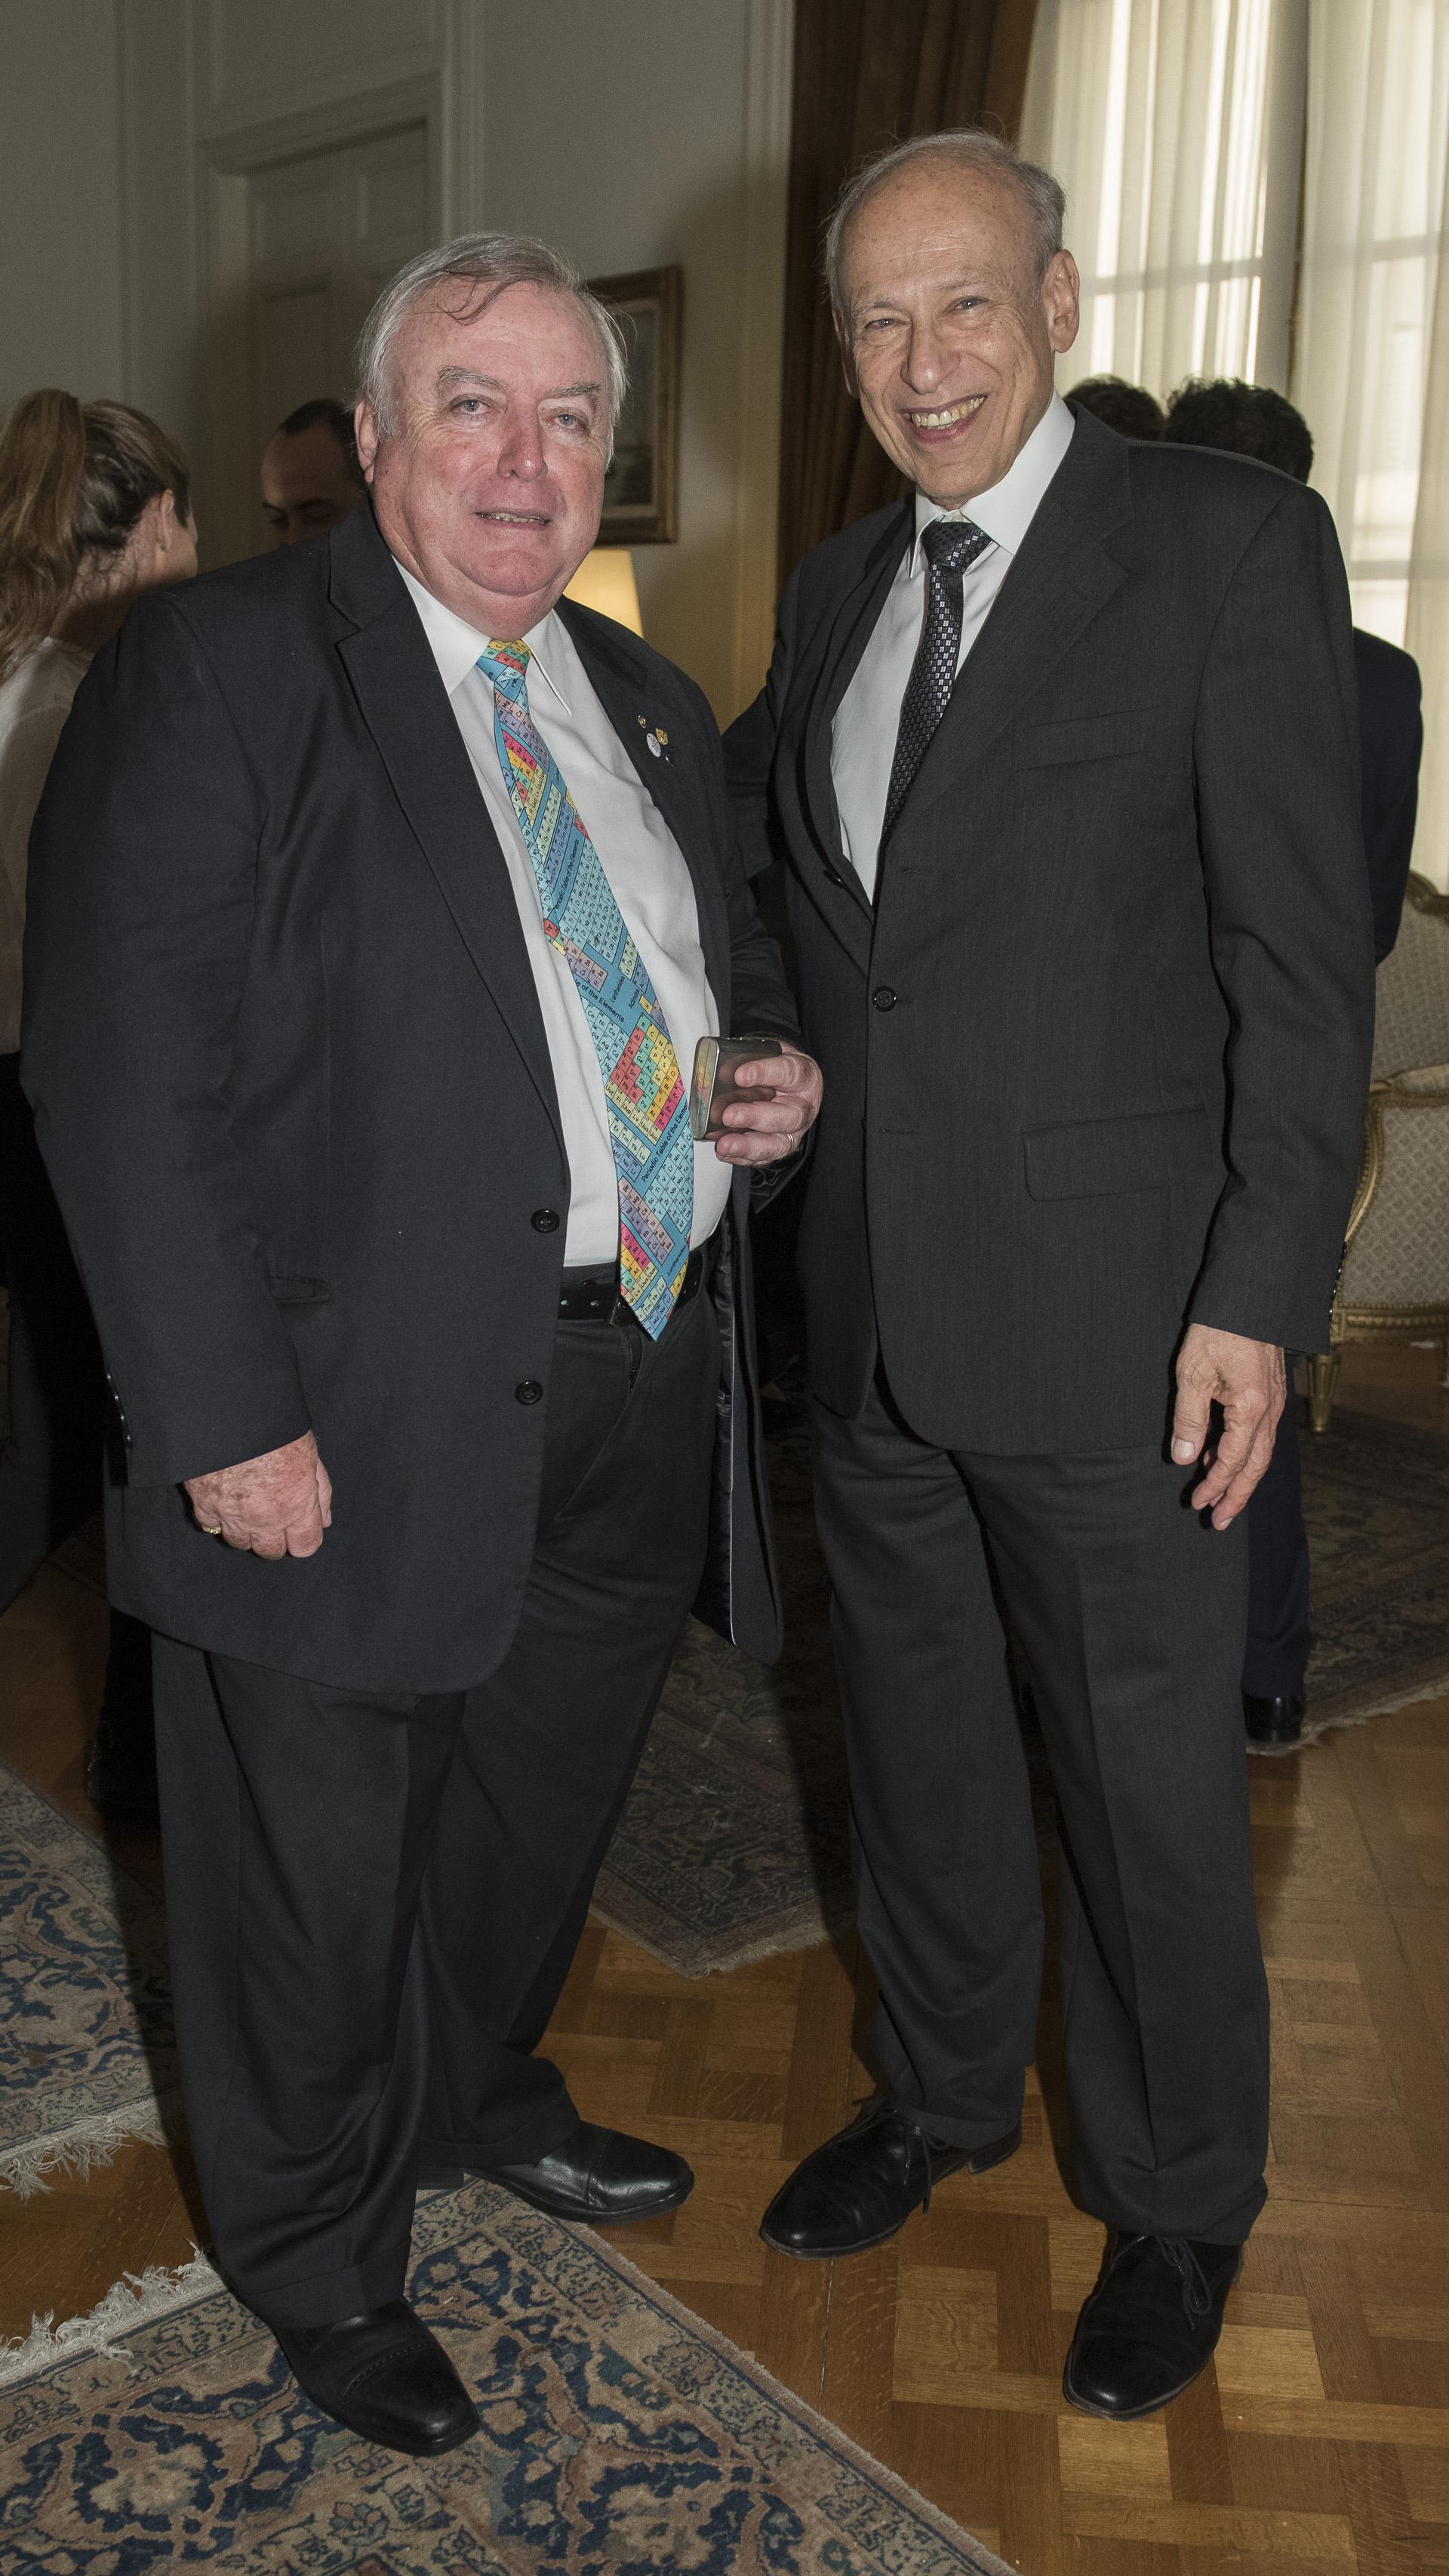 Julián De Diego y Luis Ovsejevich